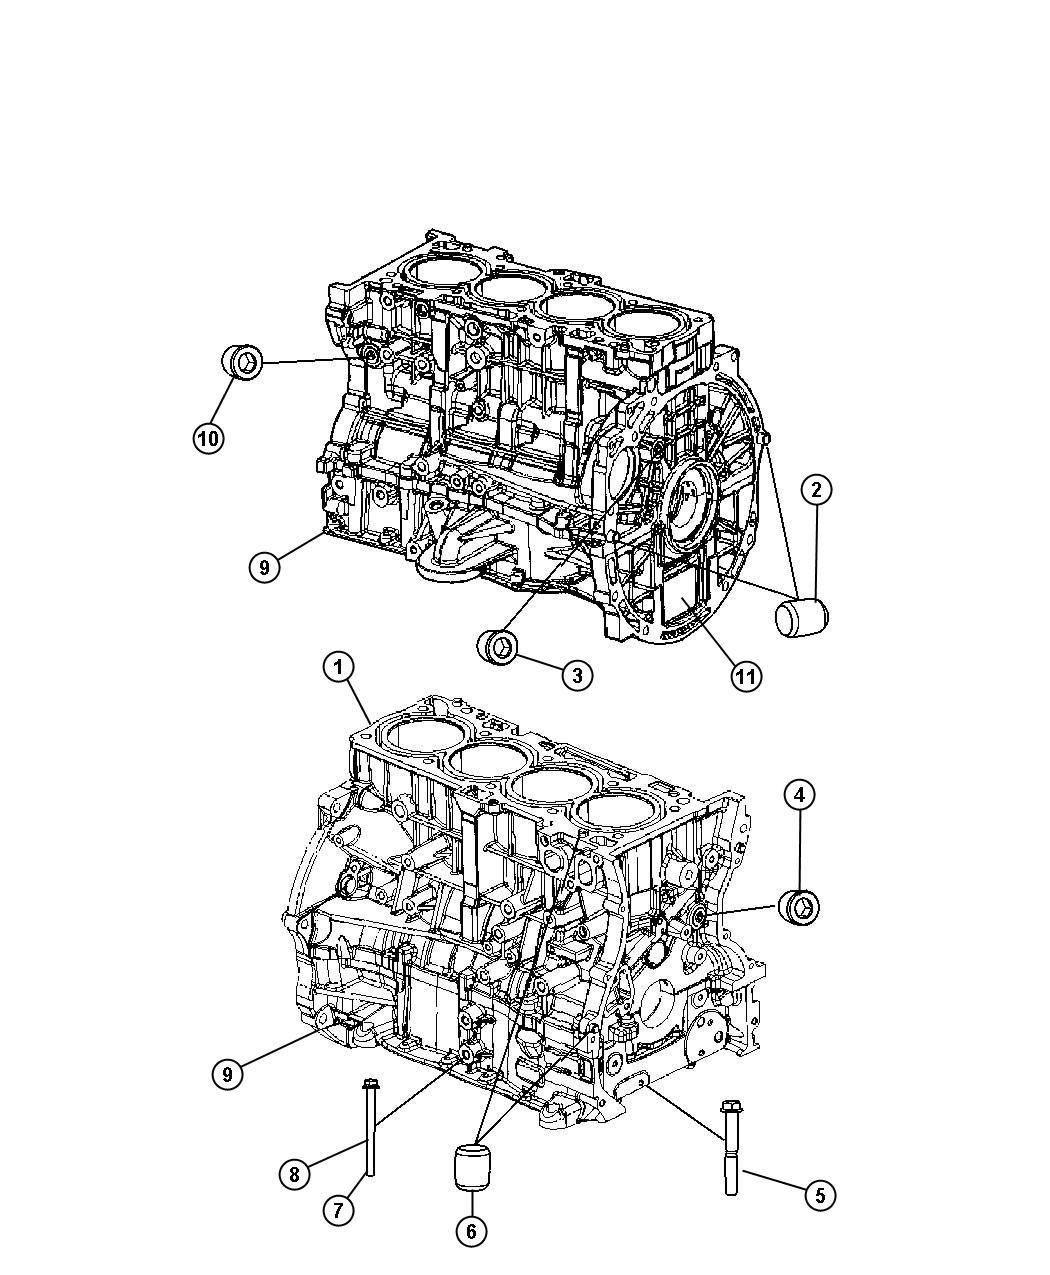 Dodge Caliber Engine Long Block New Part For Core Return